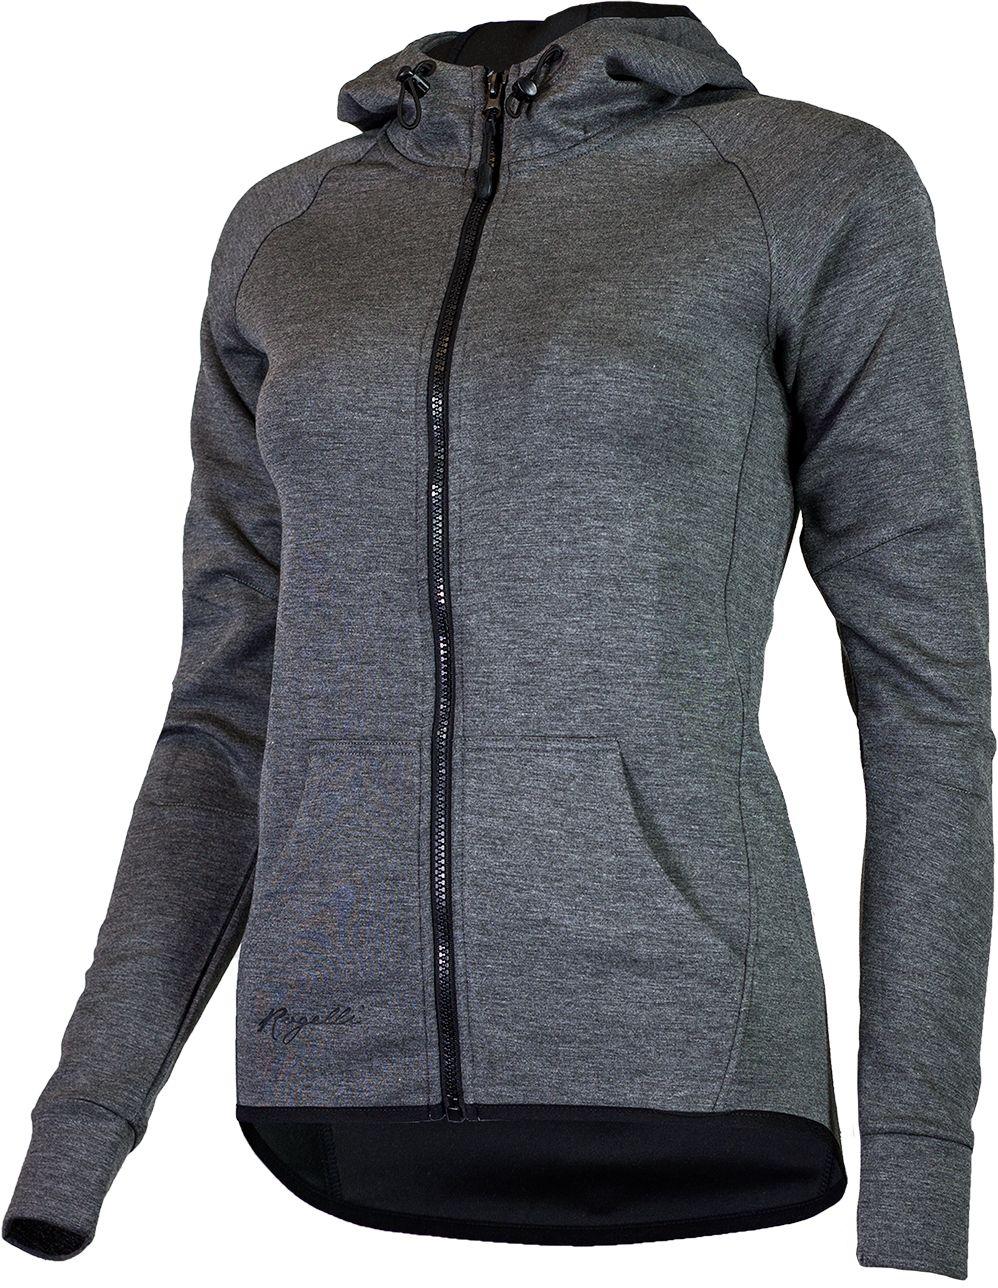 ROGELLI damska bluza z kapturem TRAINING szara Rozmiar: S,050.609.XS